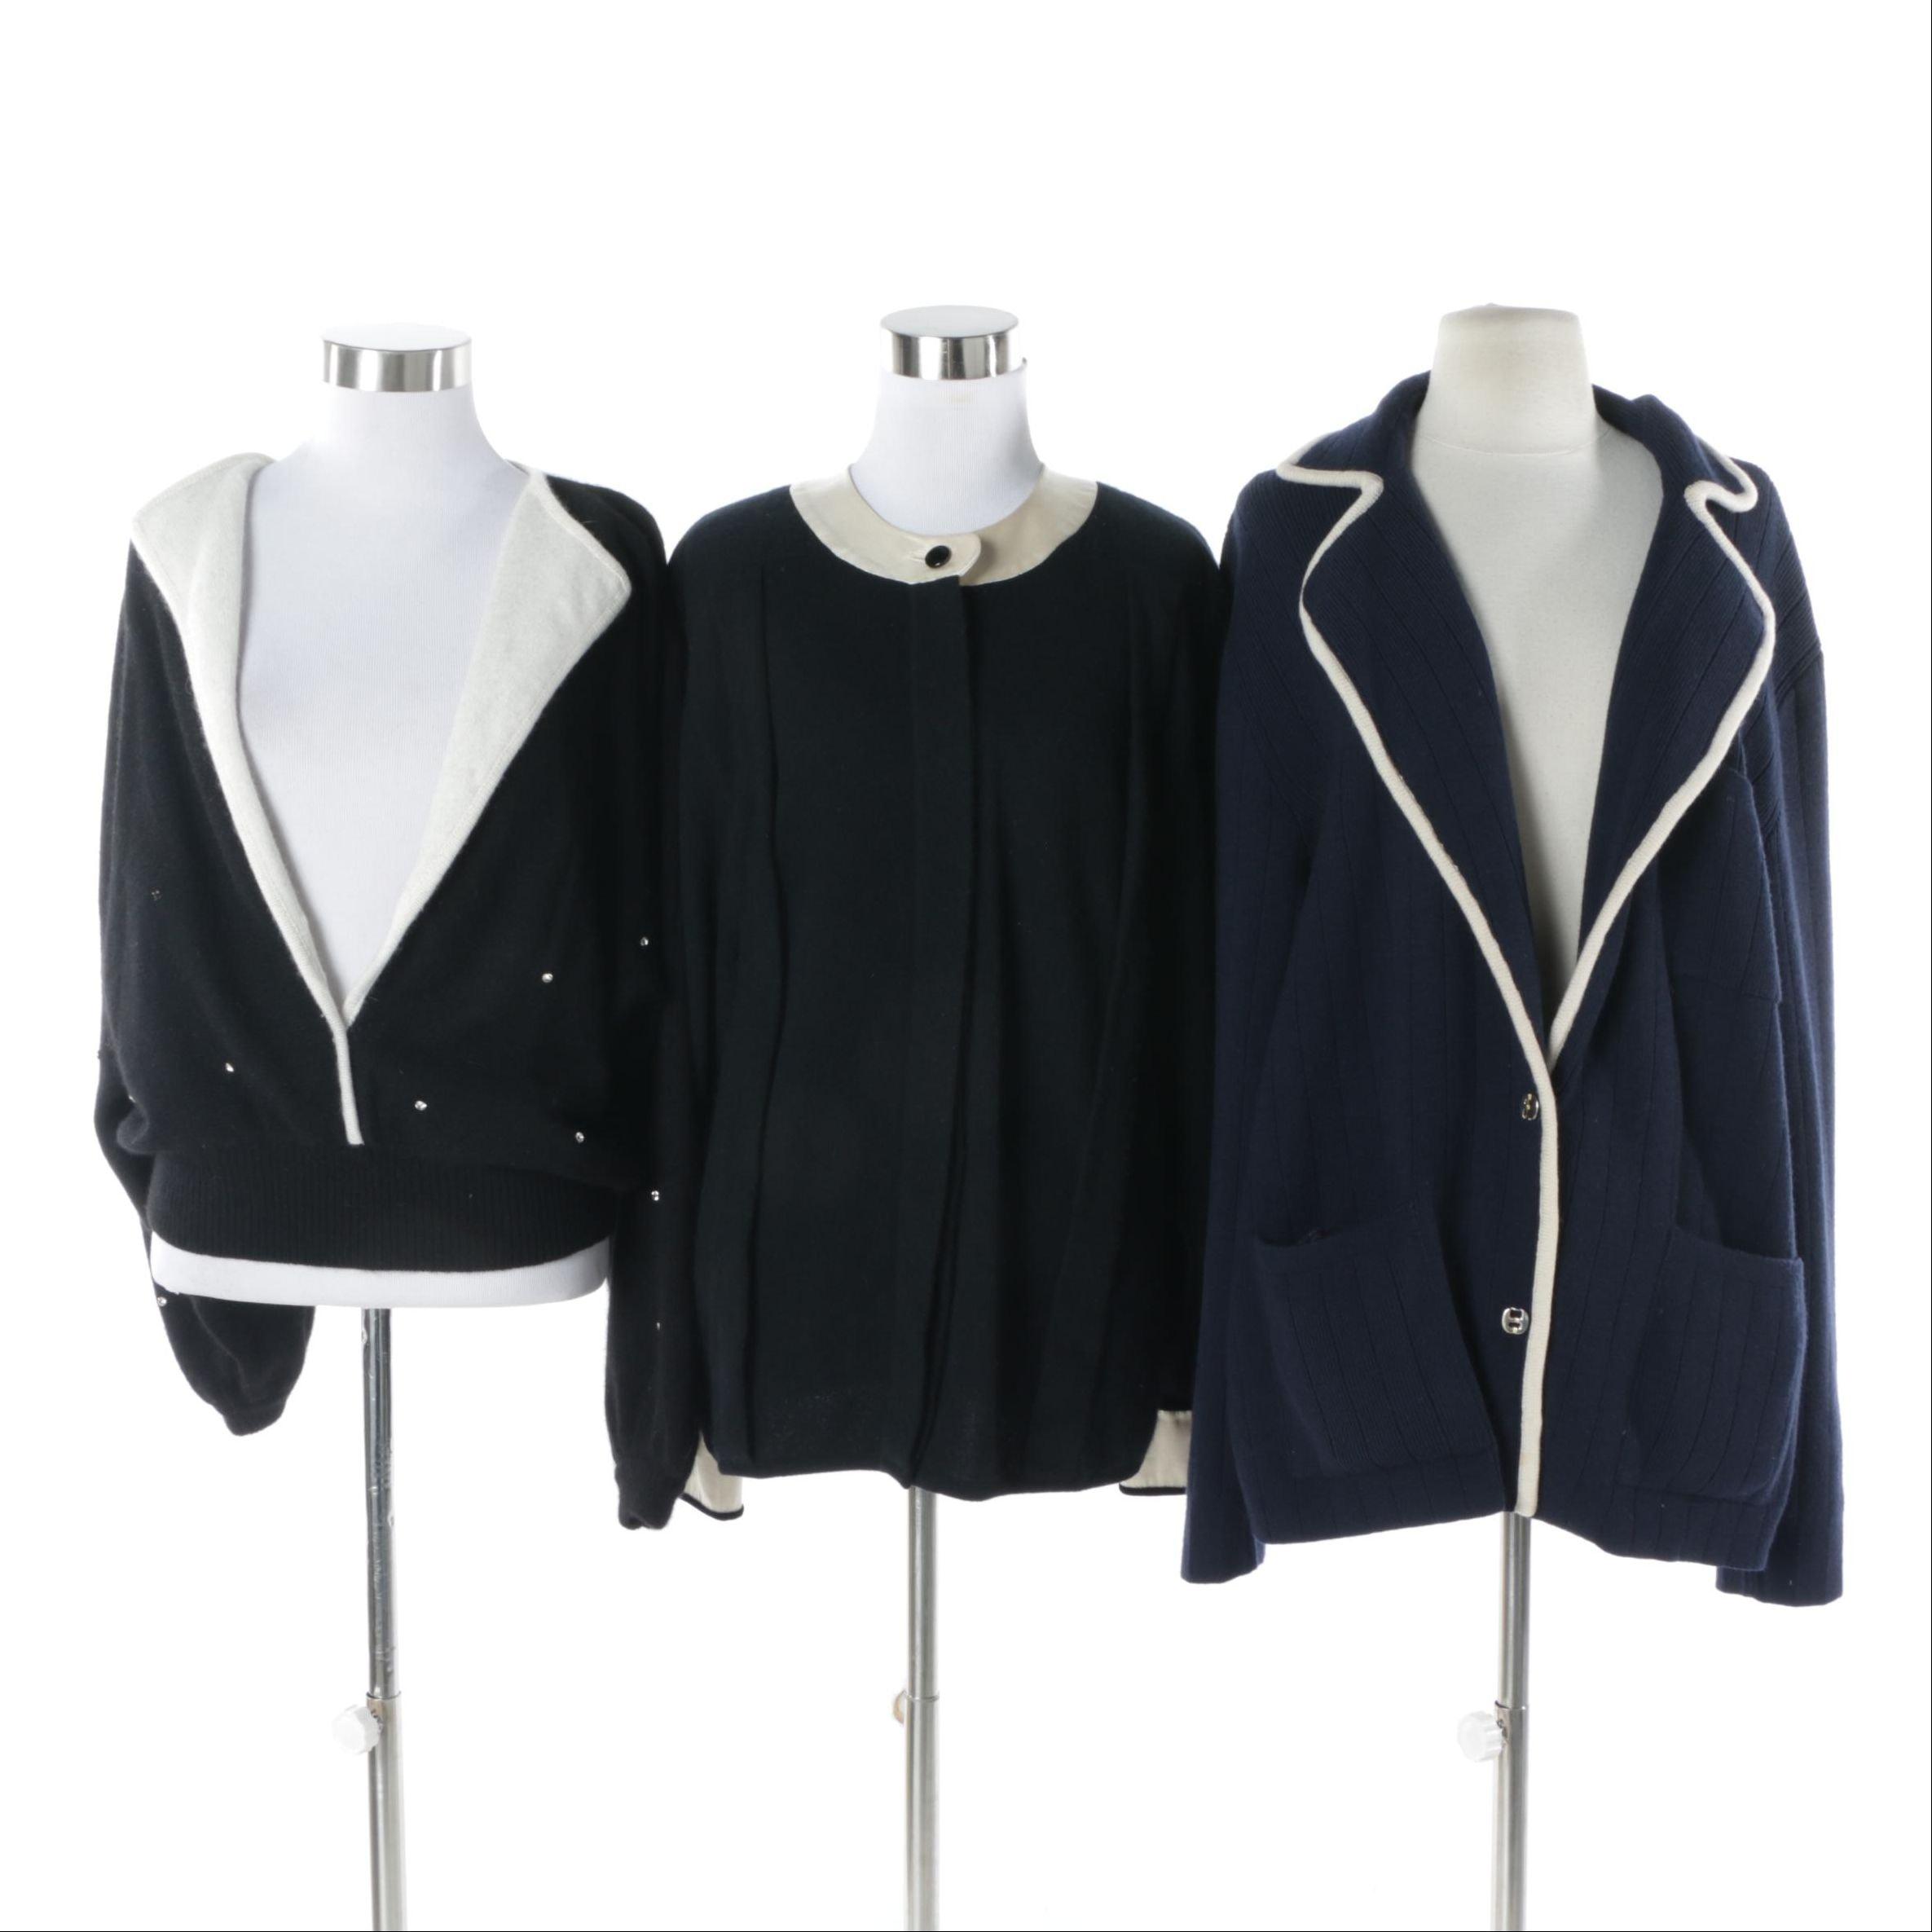 Women's Vintage Salvatore Ferragamo and Valentino Boutique Wool Sweaters